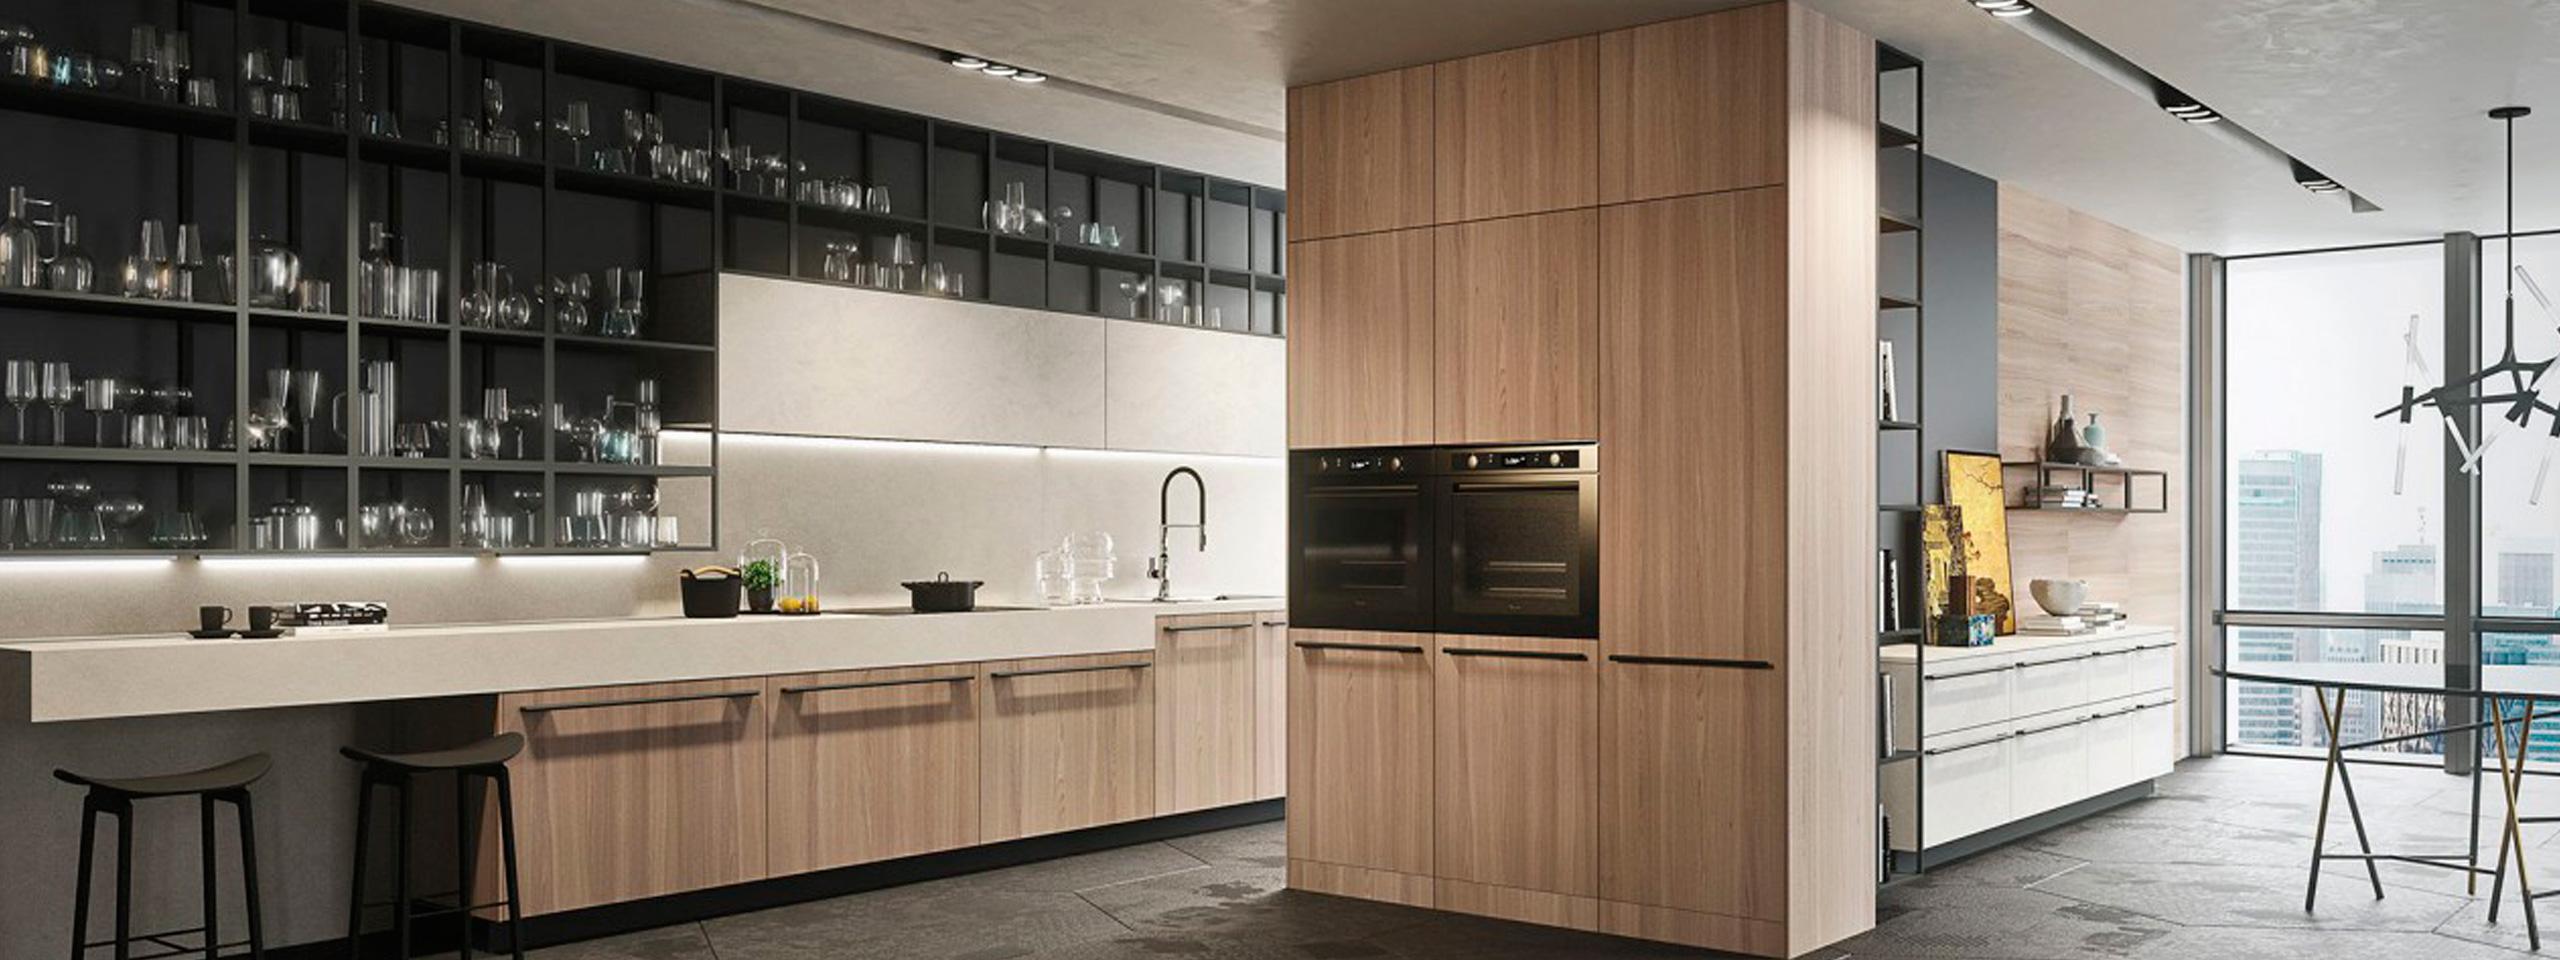 Habitat azzarito for Kitchen design awards